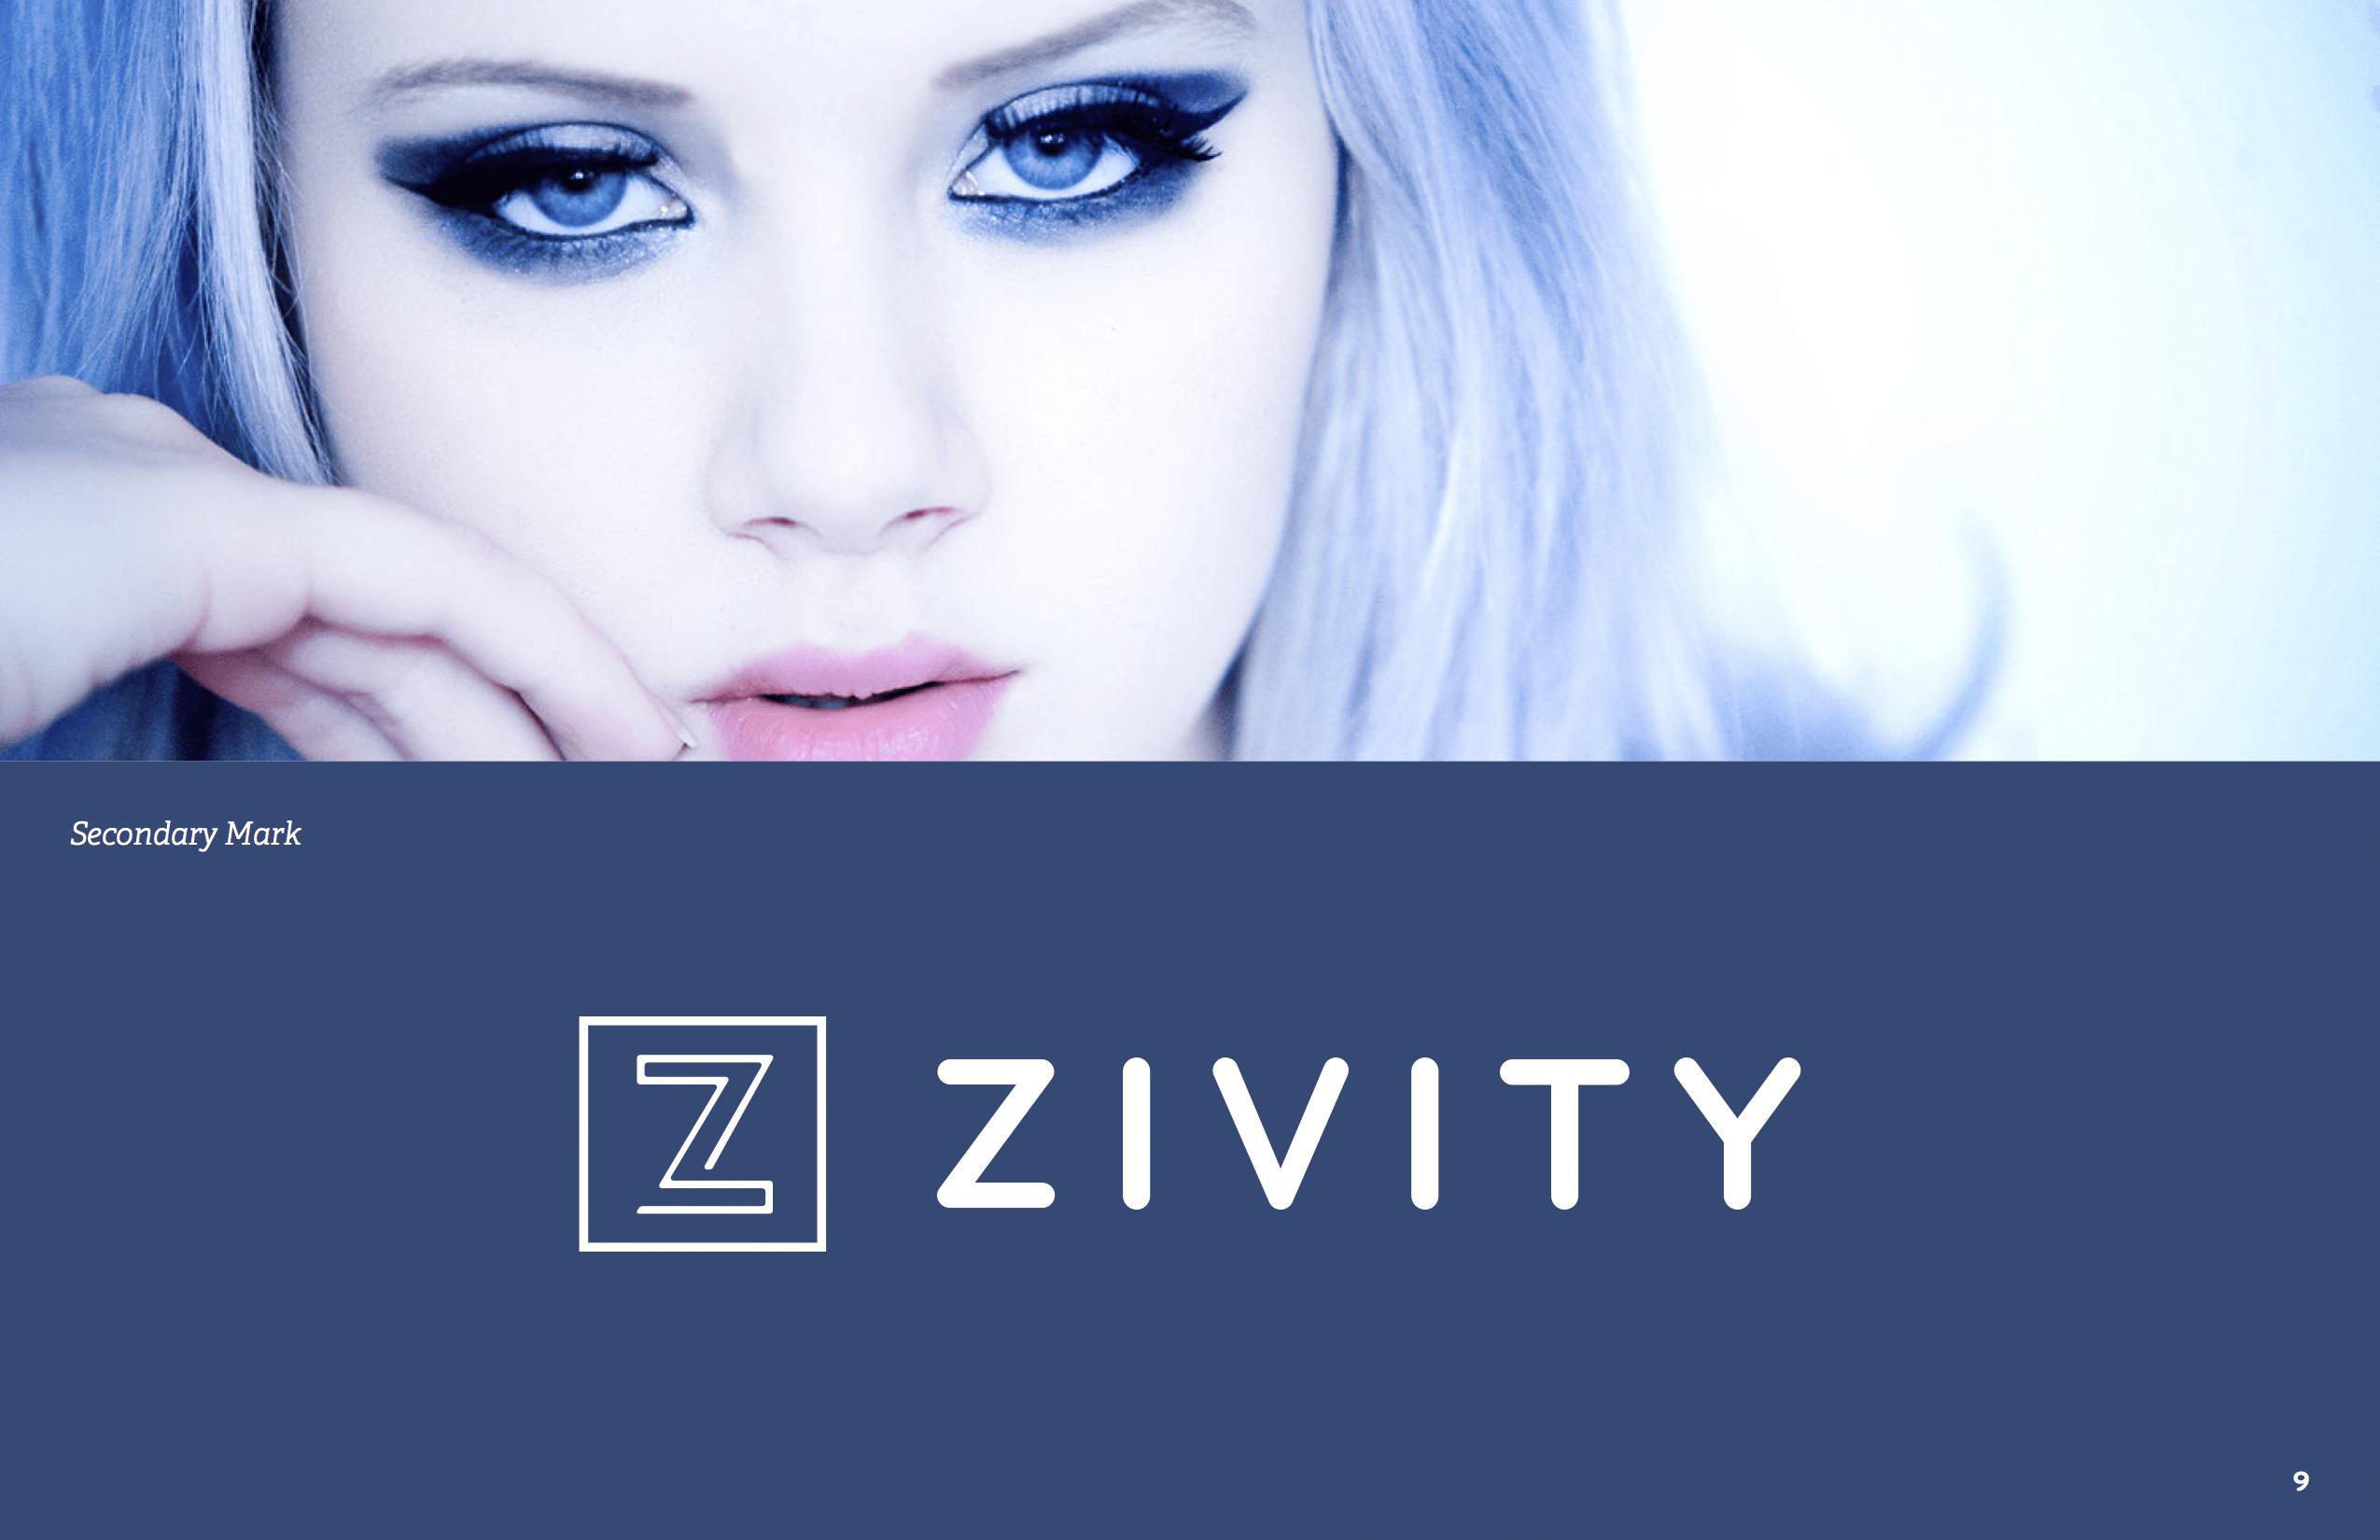 Zivity - image 9 - student project